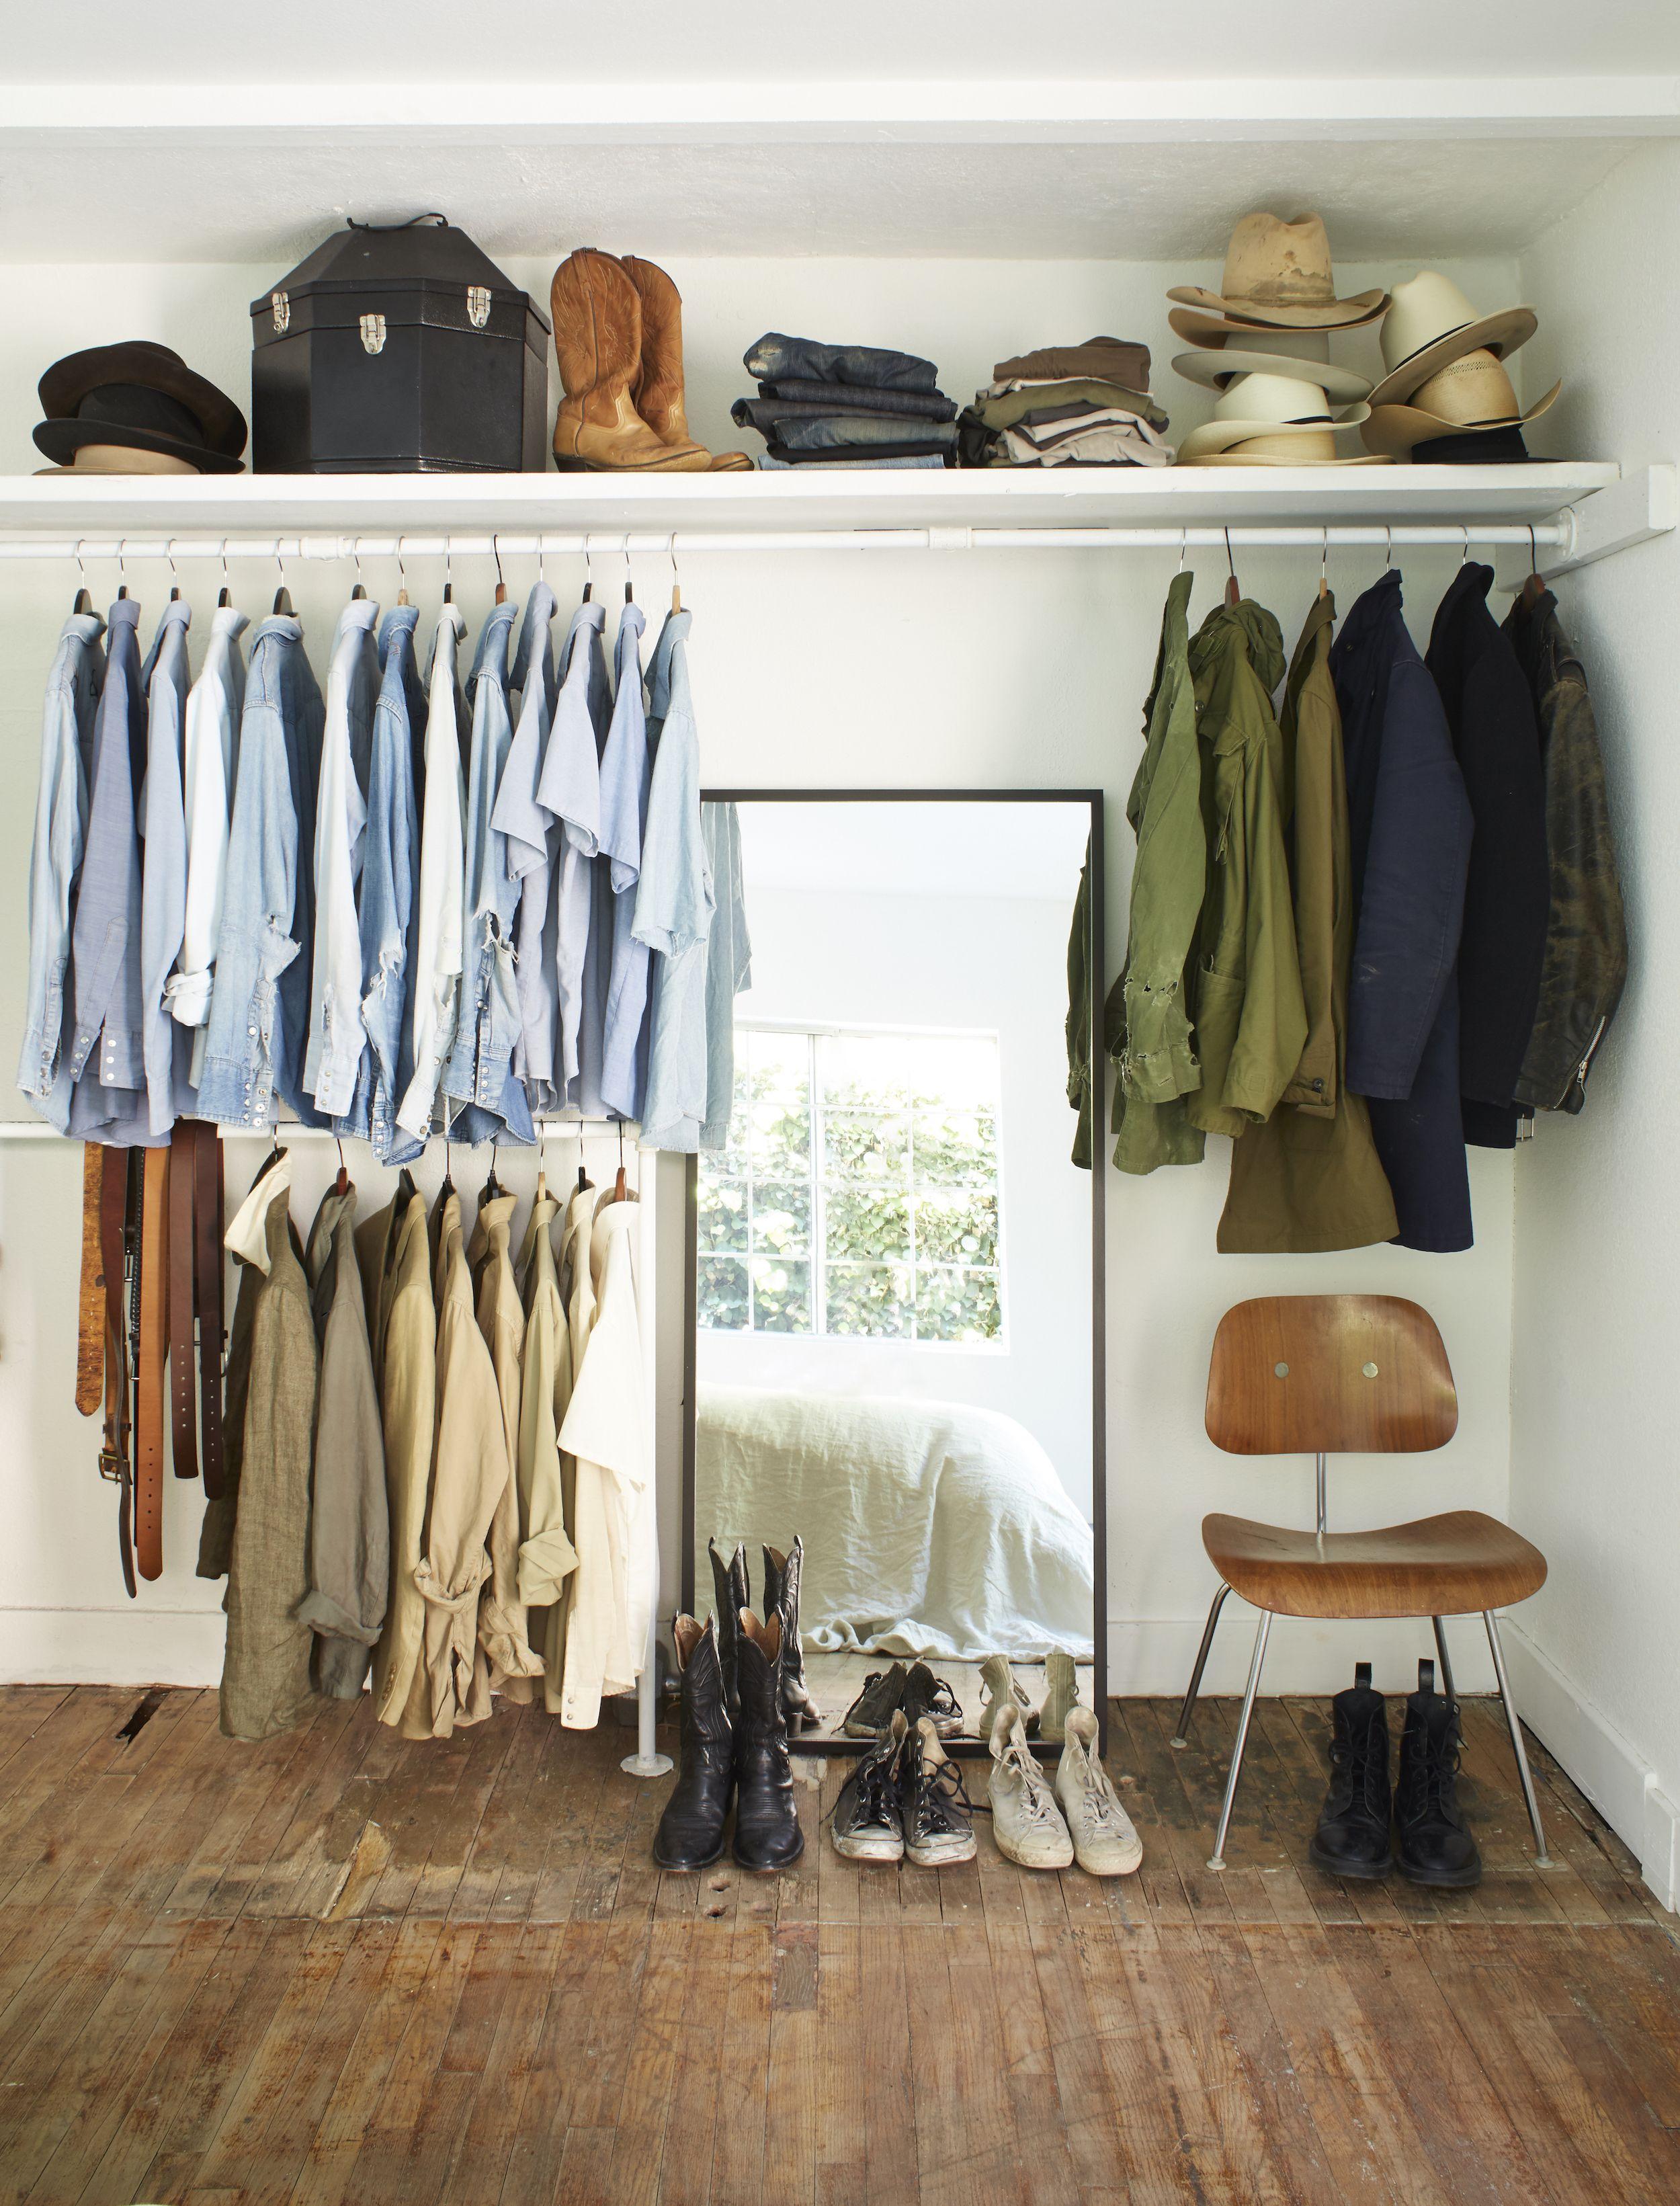 30 Best Closet Organization Ideas How To Organize Your Closet